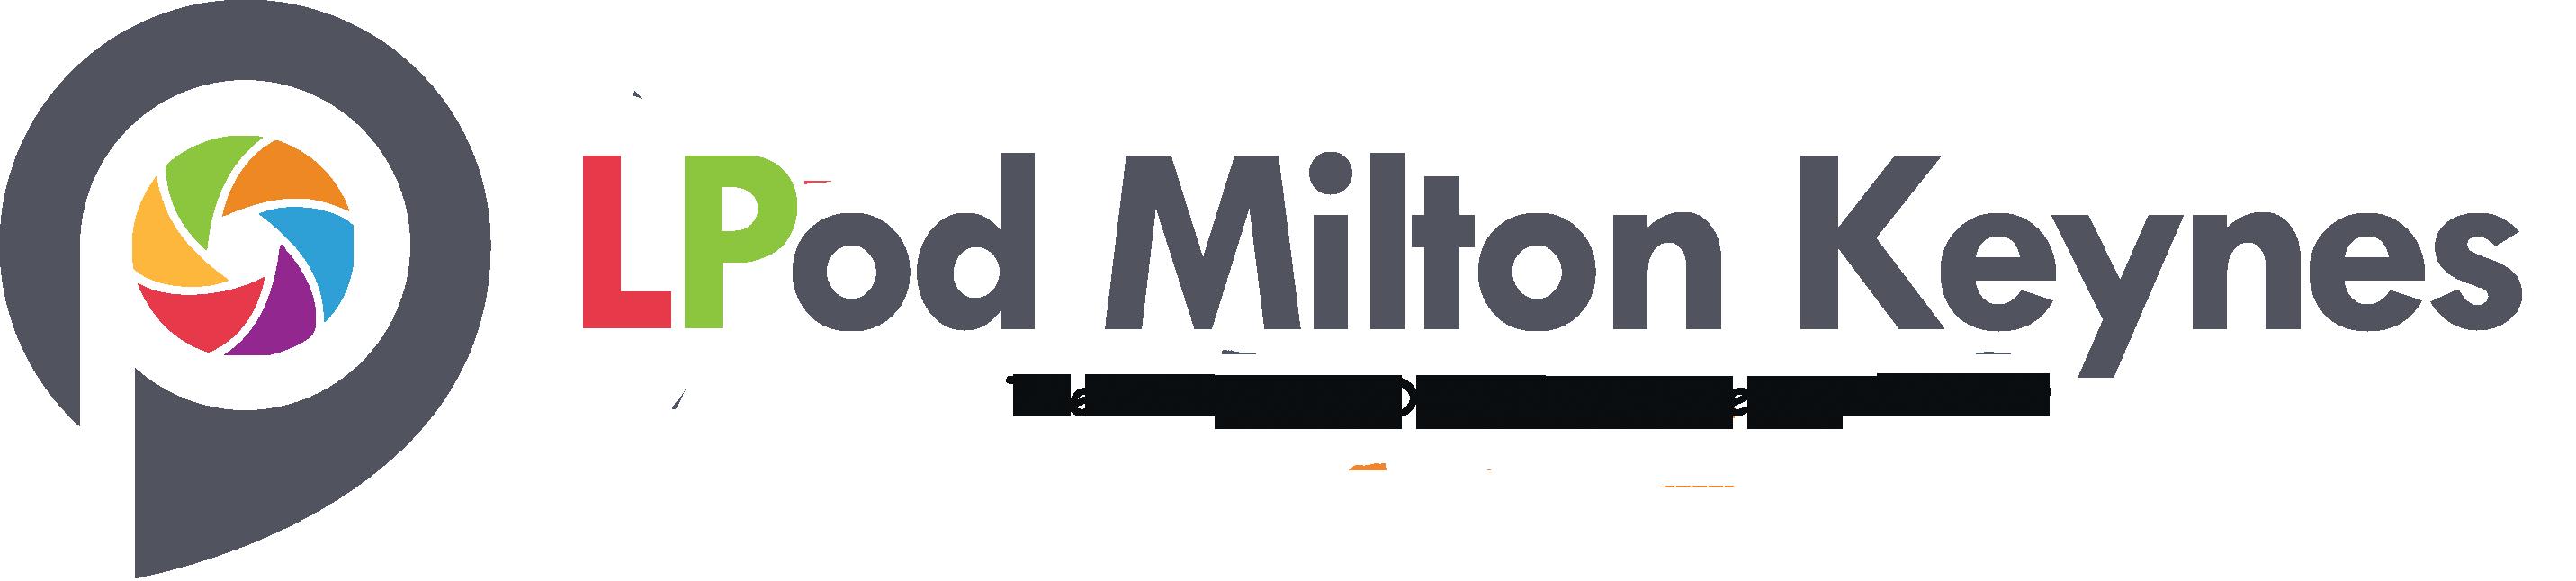 intensive driving courses milton keynes, intensive driving lessons milton keynes